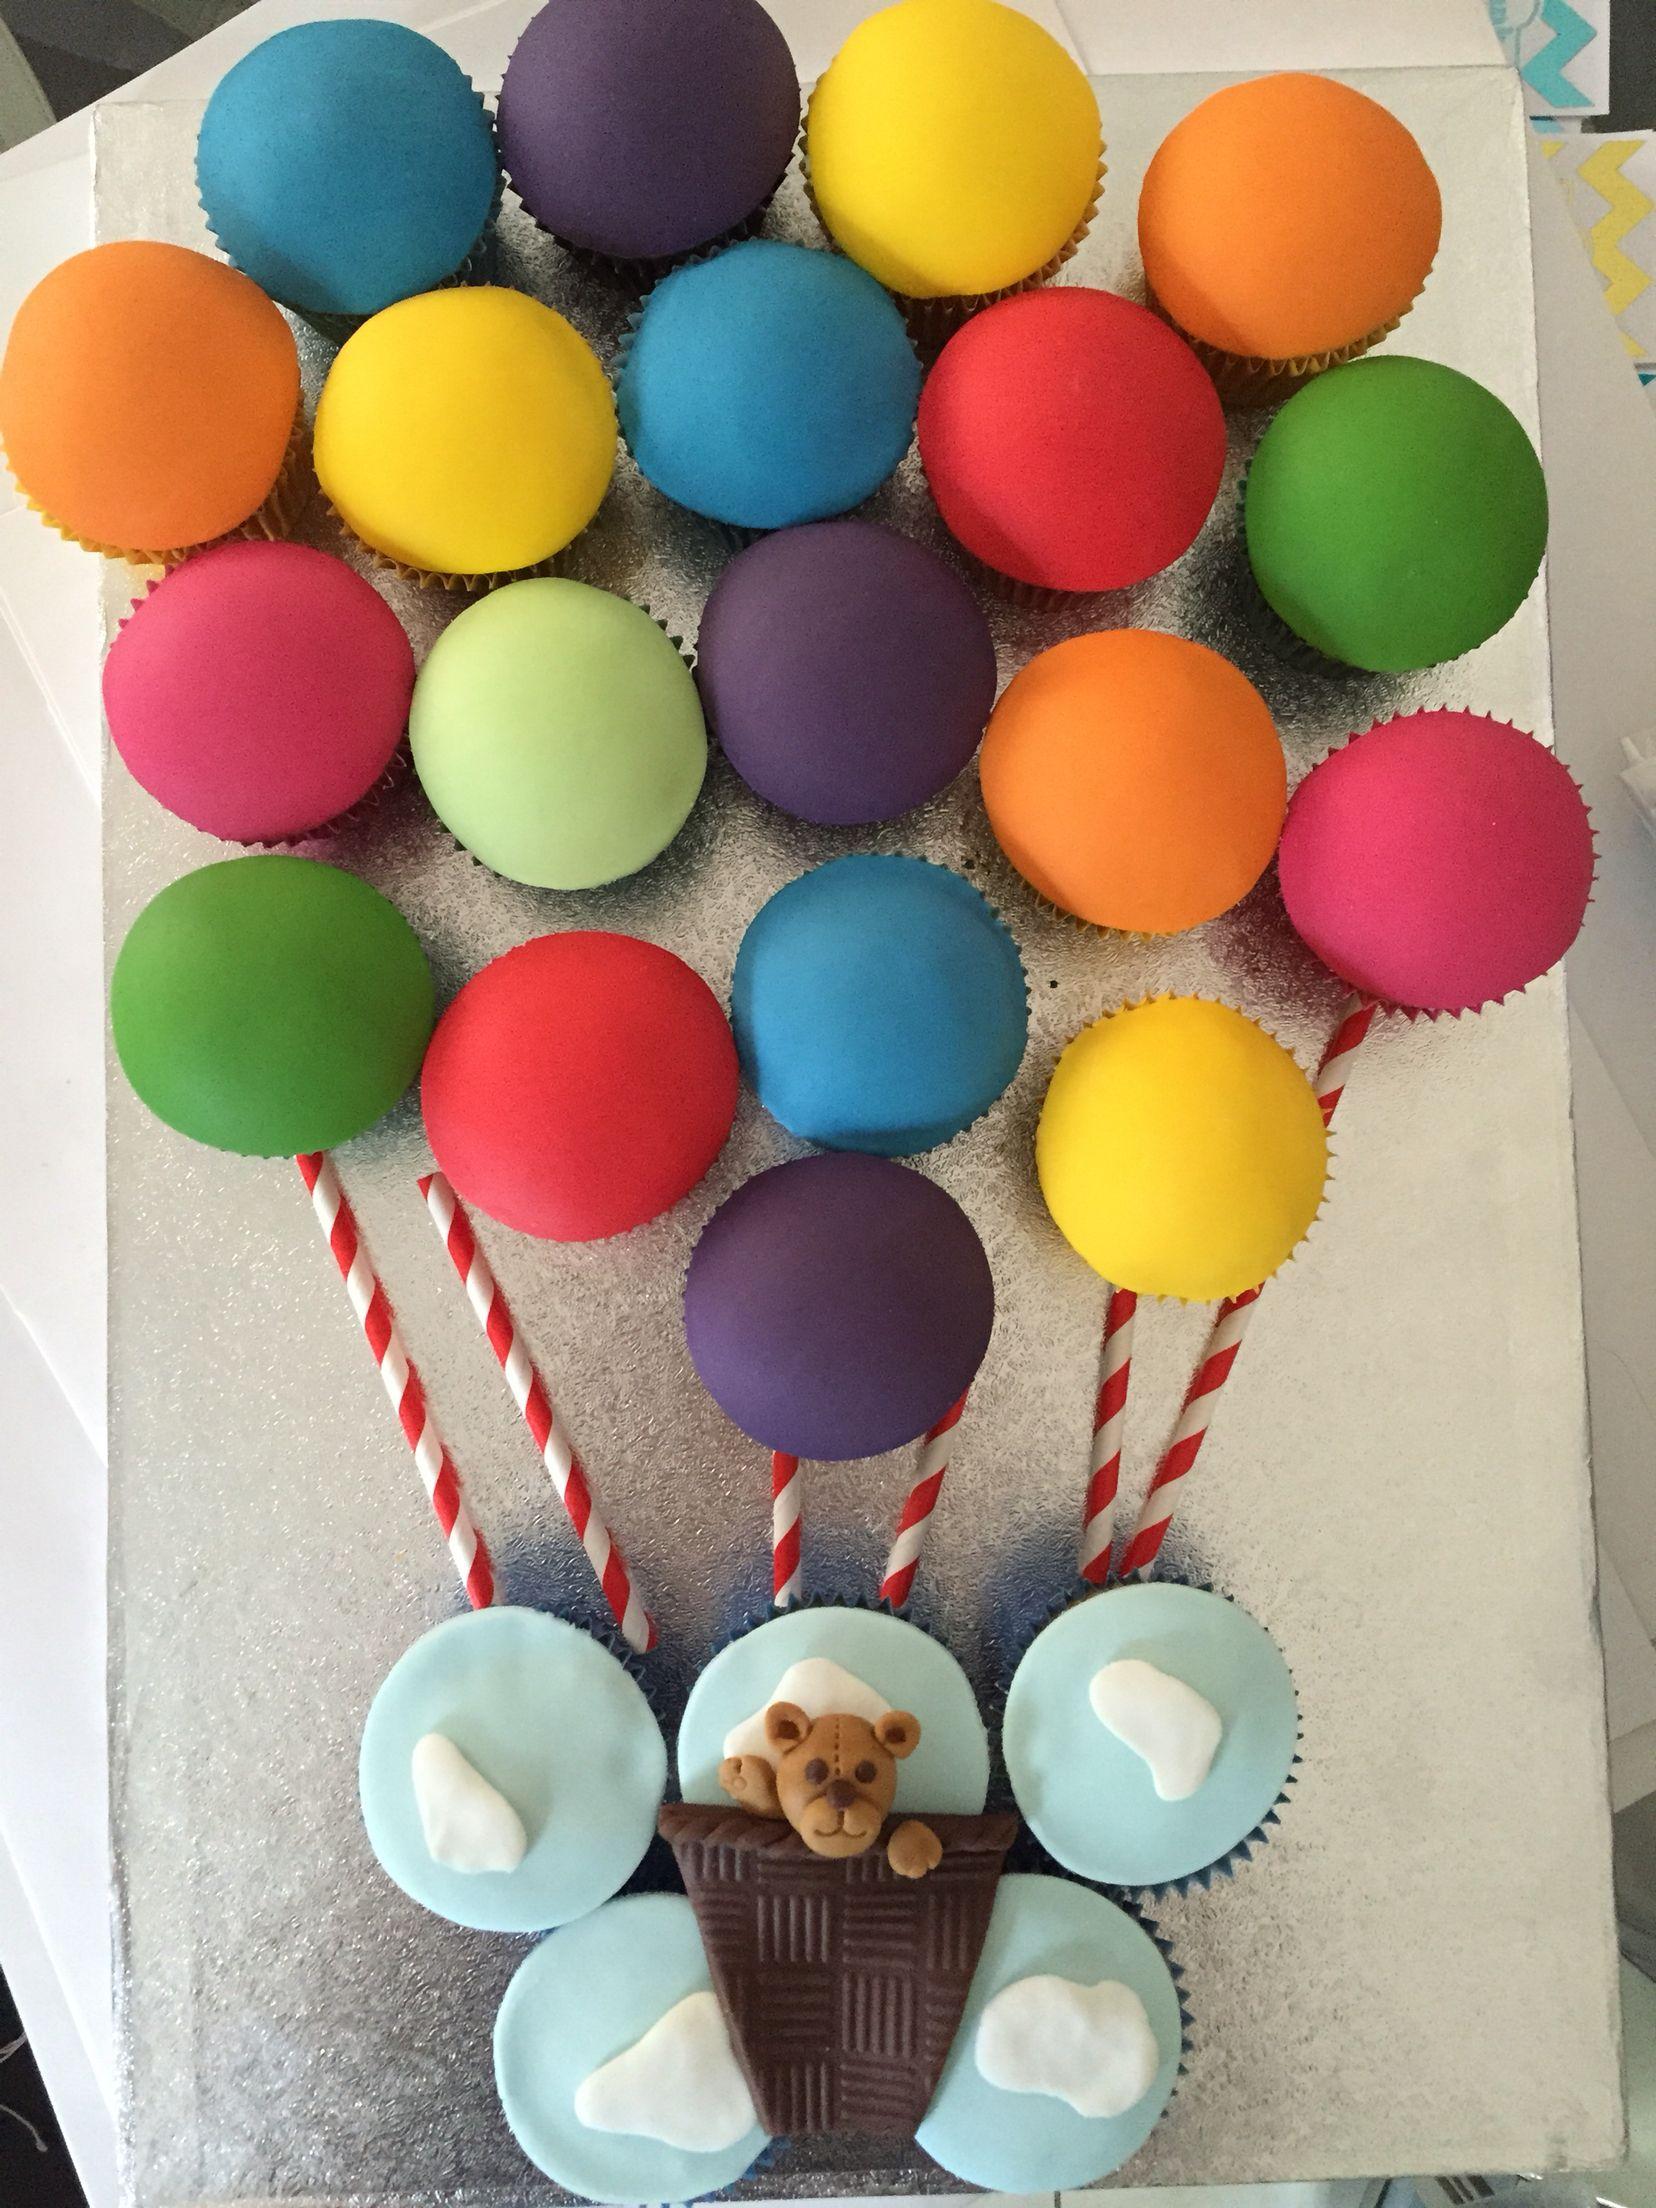 Teddy Hot Air Ballon Cupcake Birthday Cake